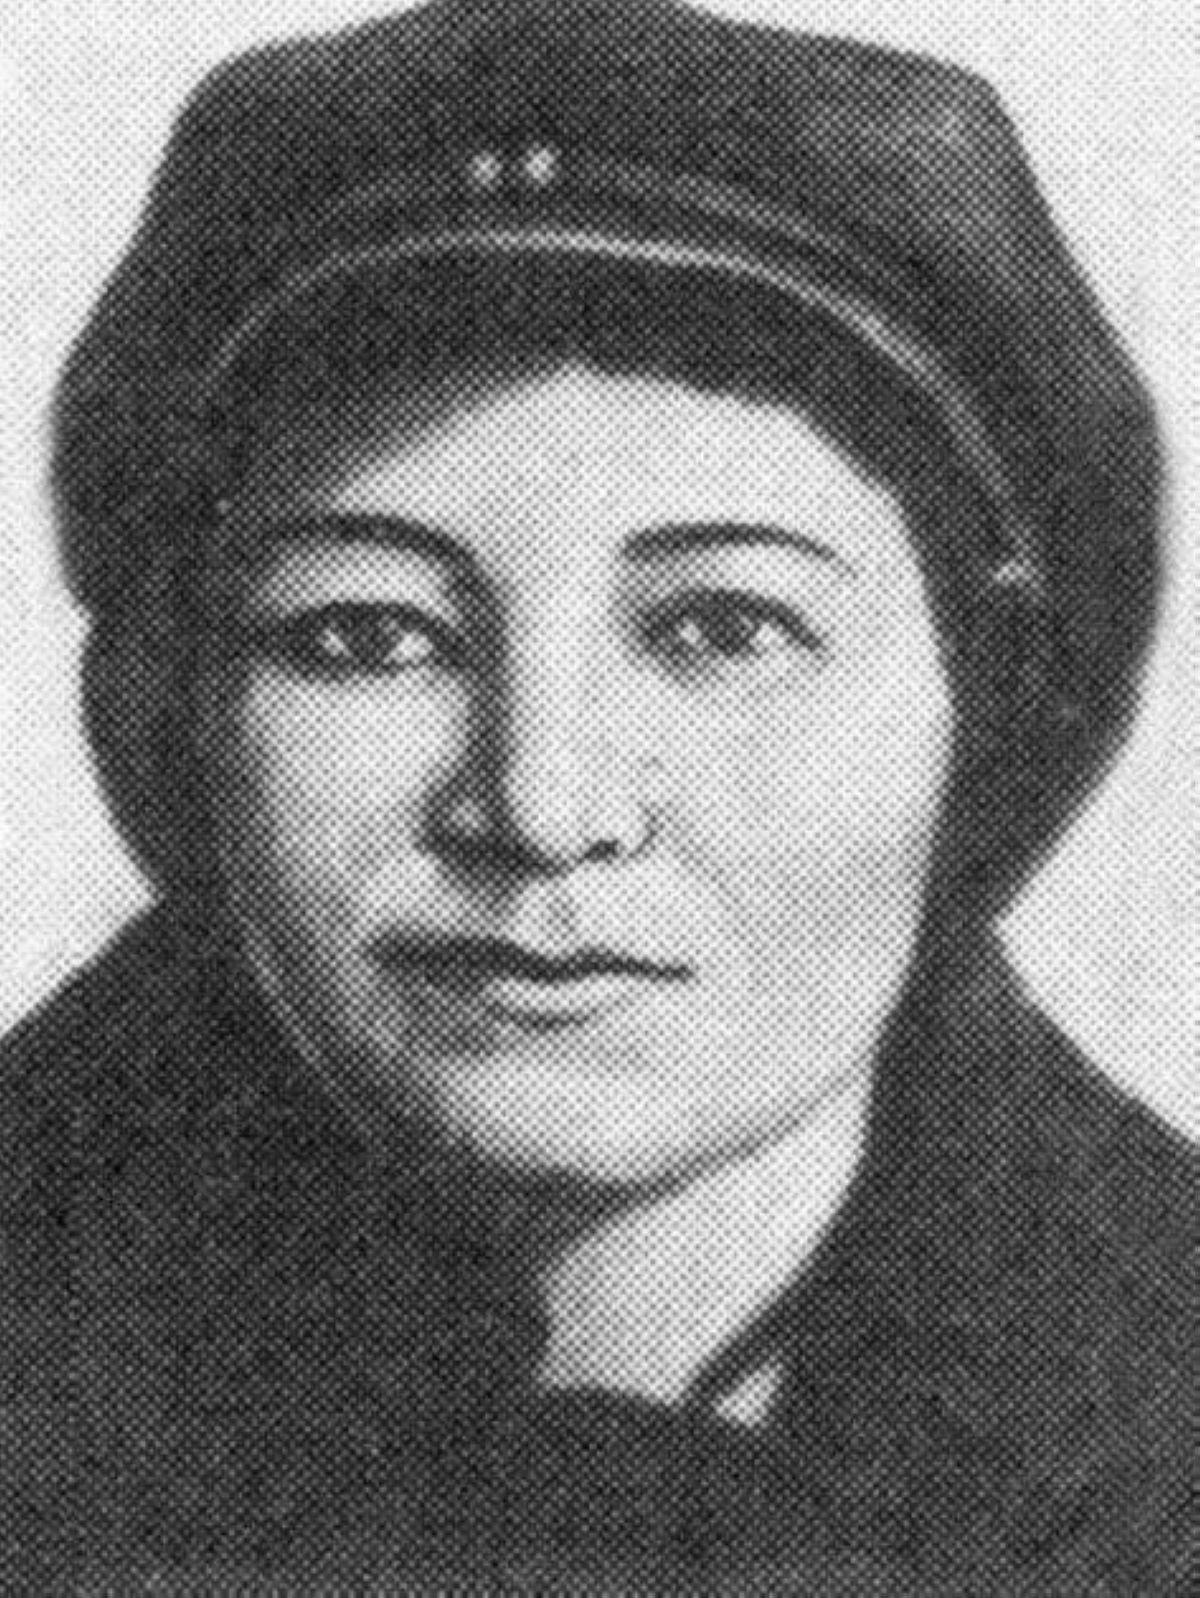 a.orazbaeva